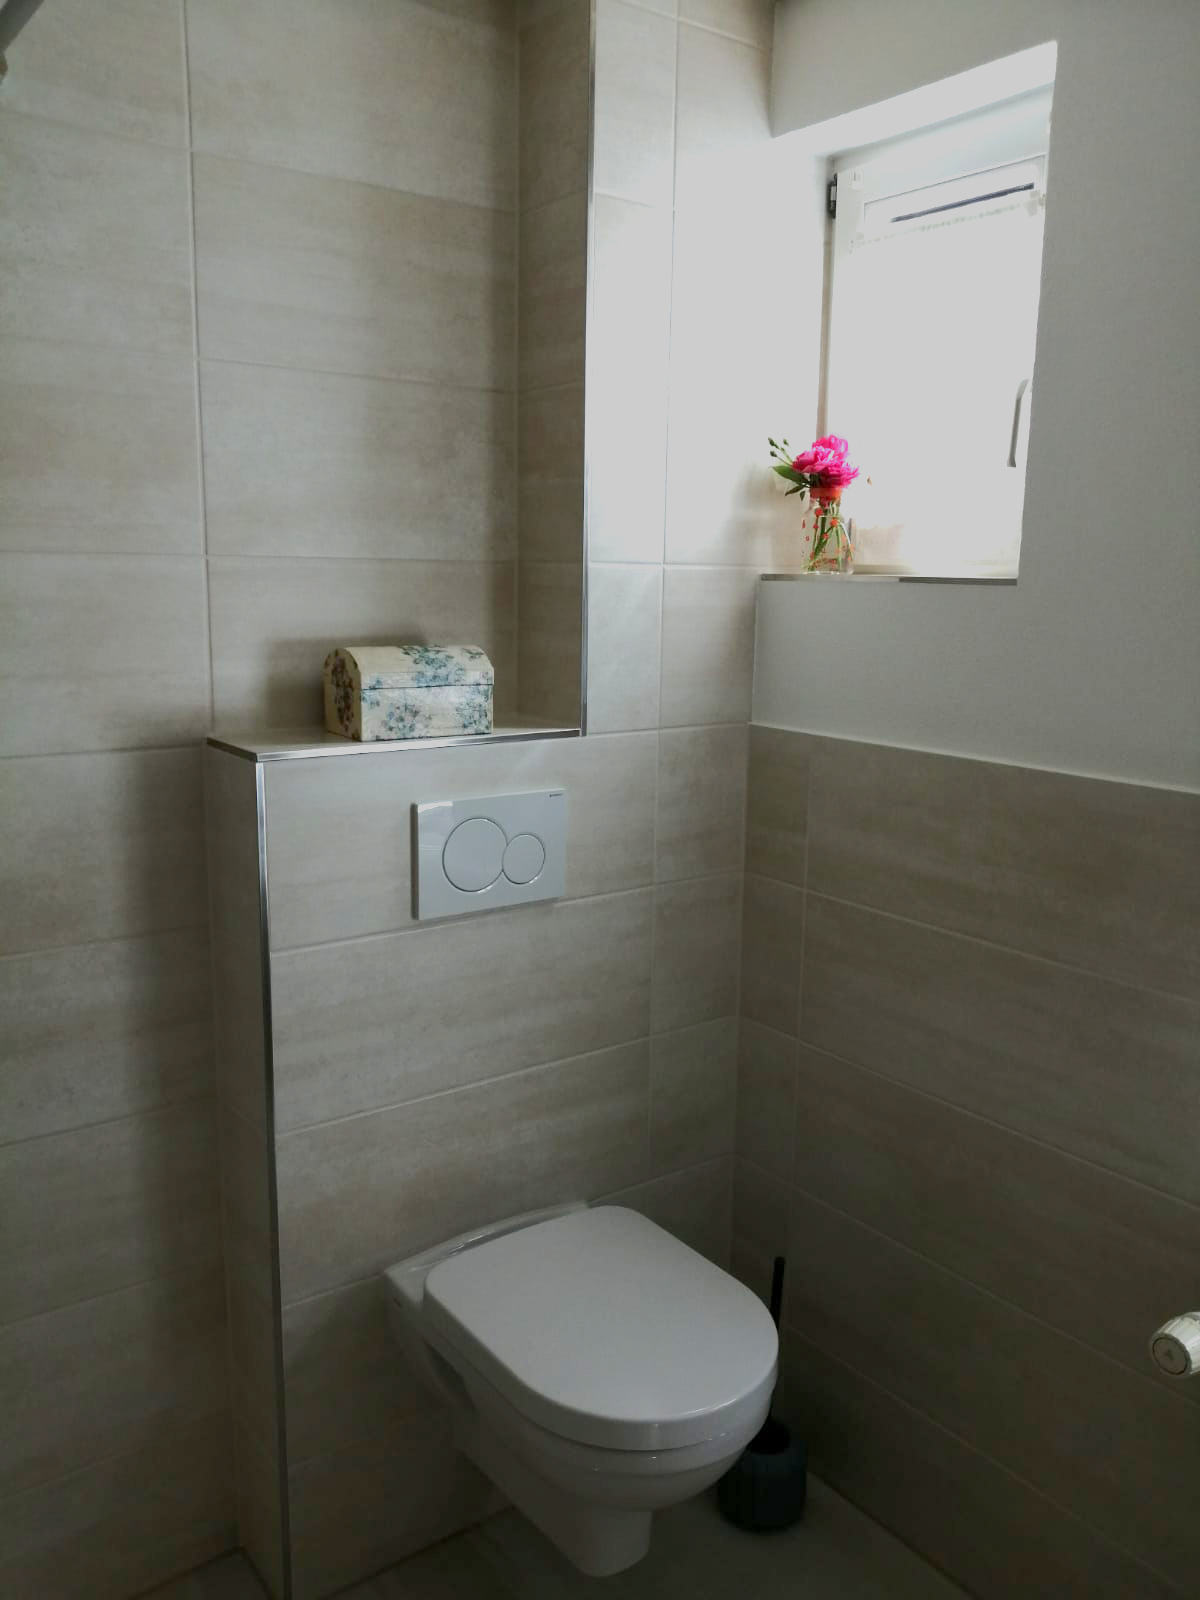 Sanibel Wand-WC 3001 spülrandlos. Seniorengerecht auf 46 cm Höhe montiert